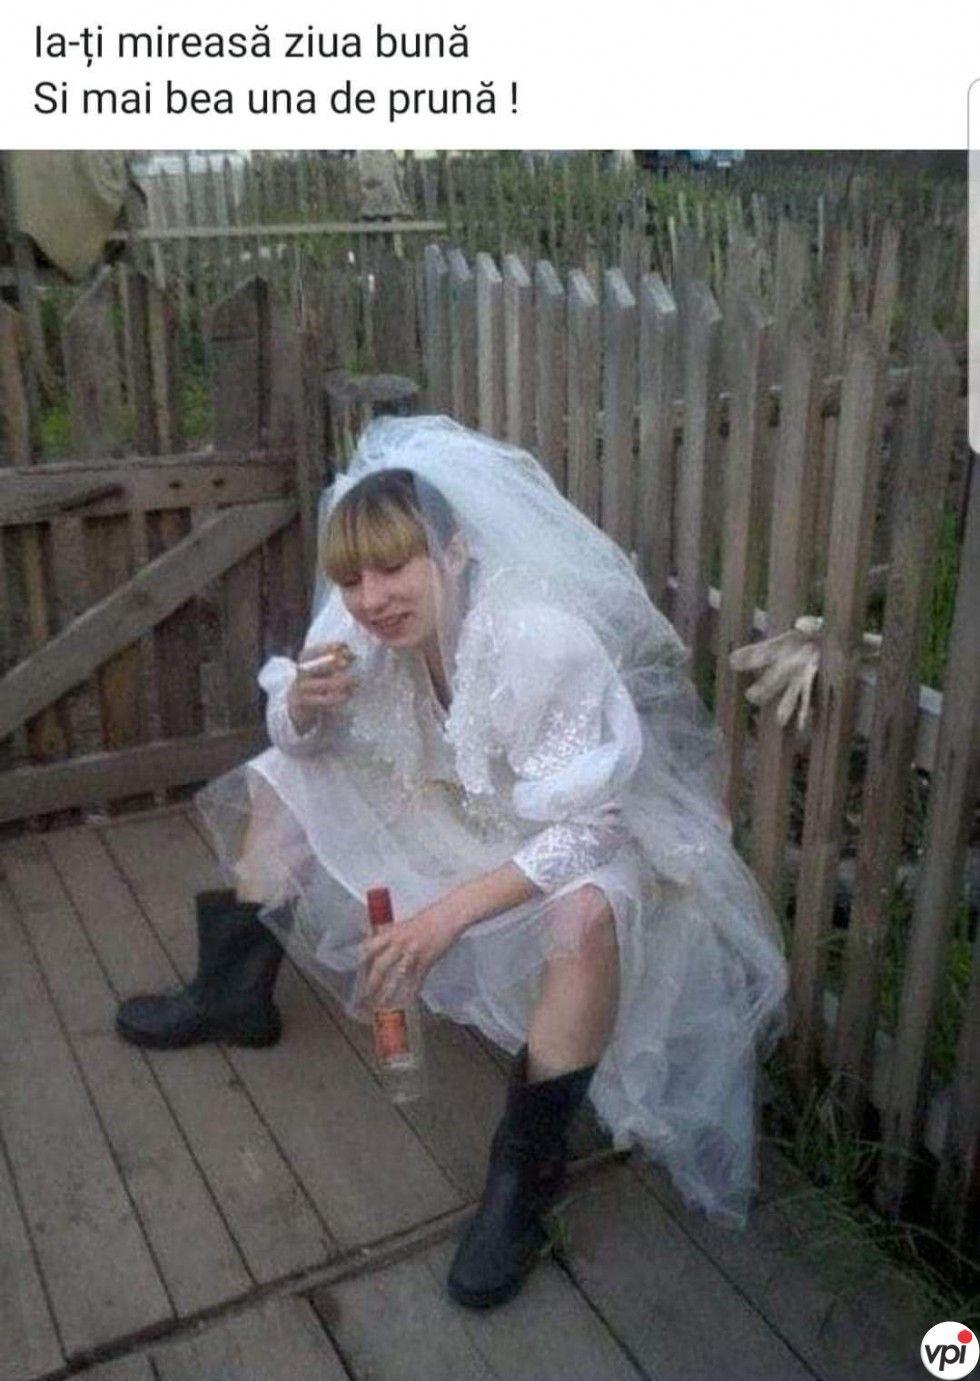 Cauta? i o femeie pentru nunta elve? iana